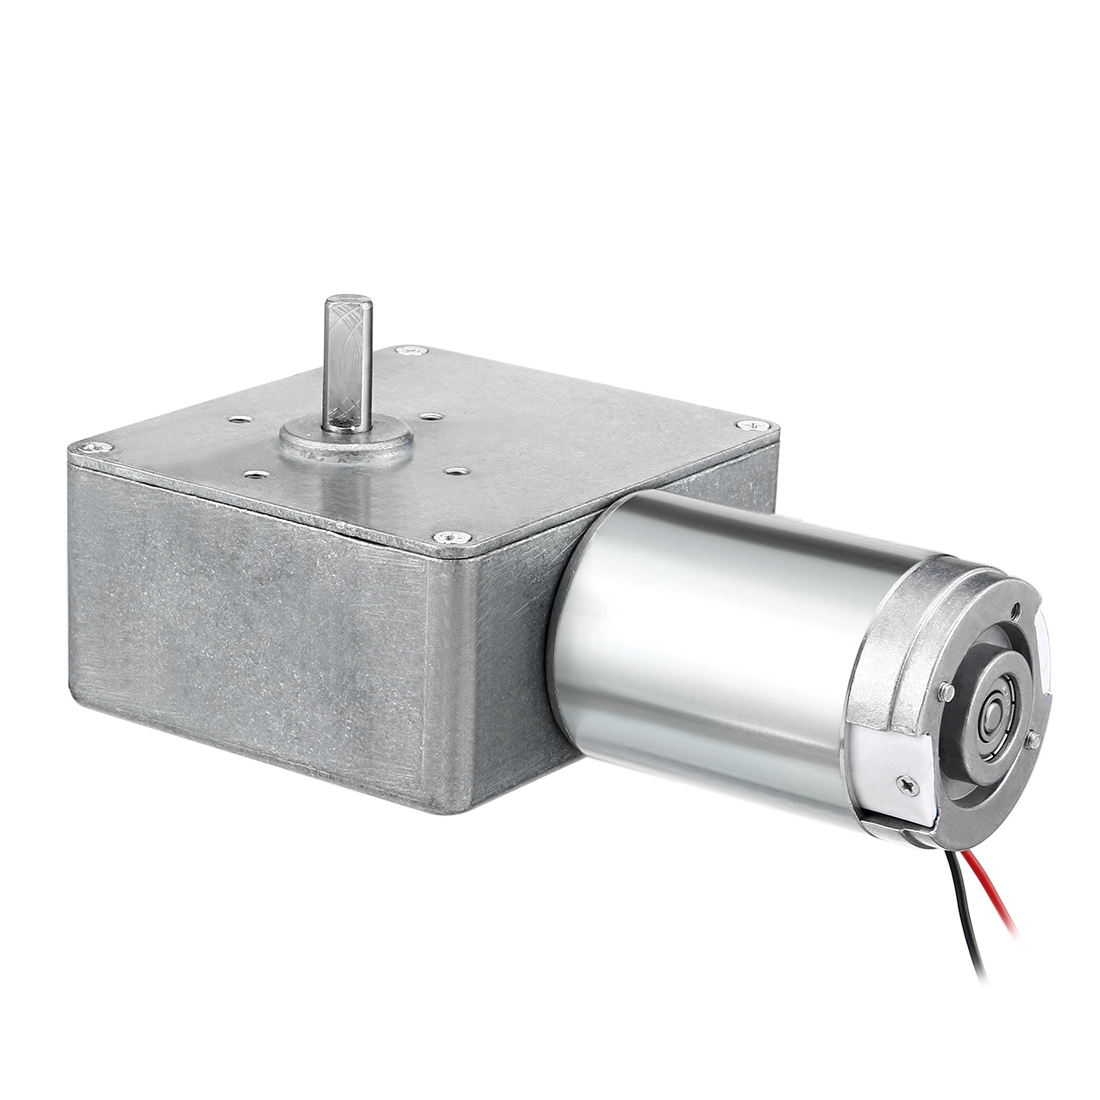 DC12V 2A 30RPM 8mm Shaft High Torque Reversible Turbine Worm GearMotor Reduction